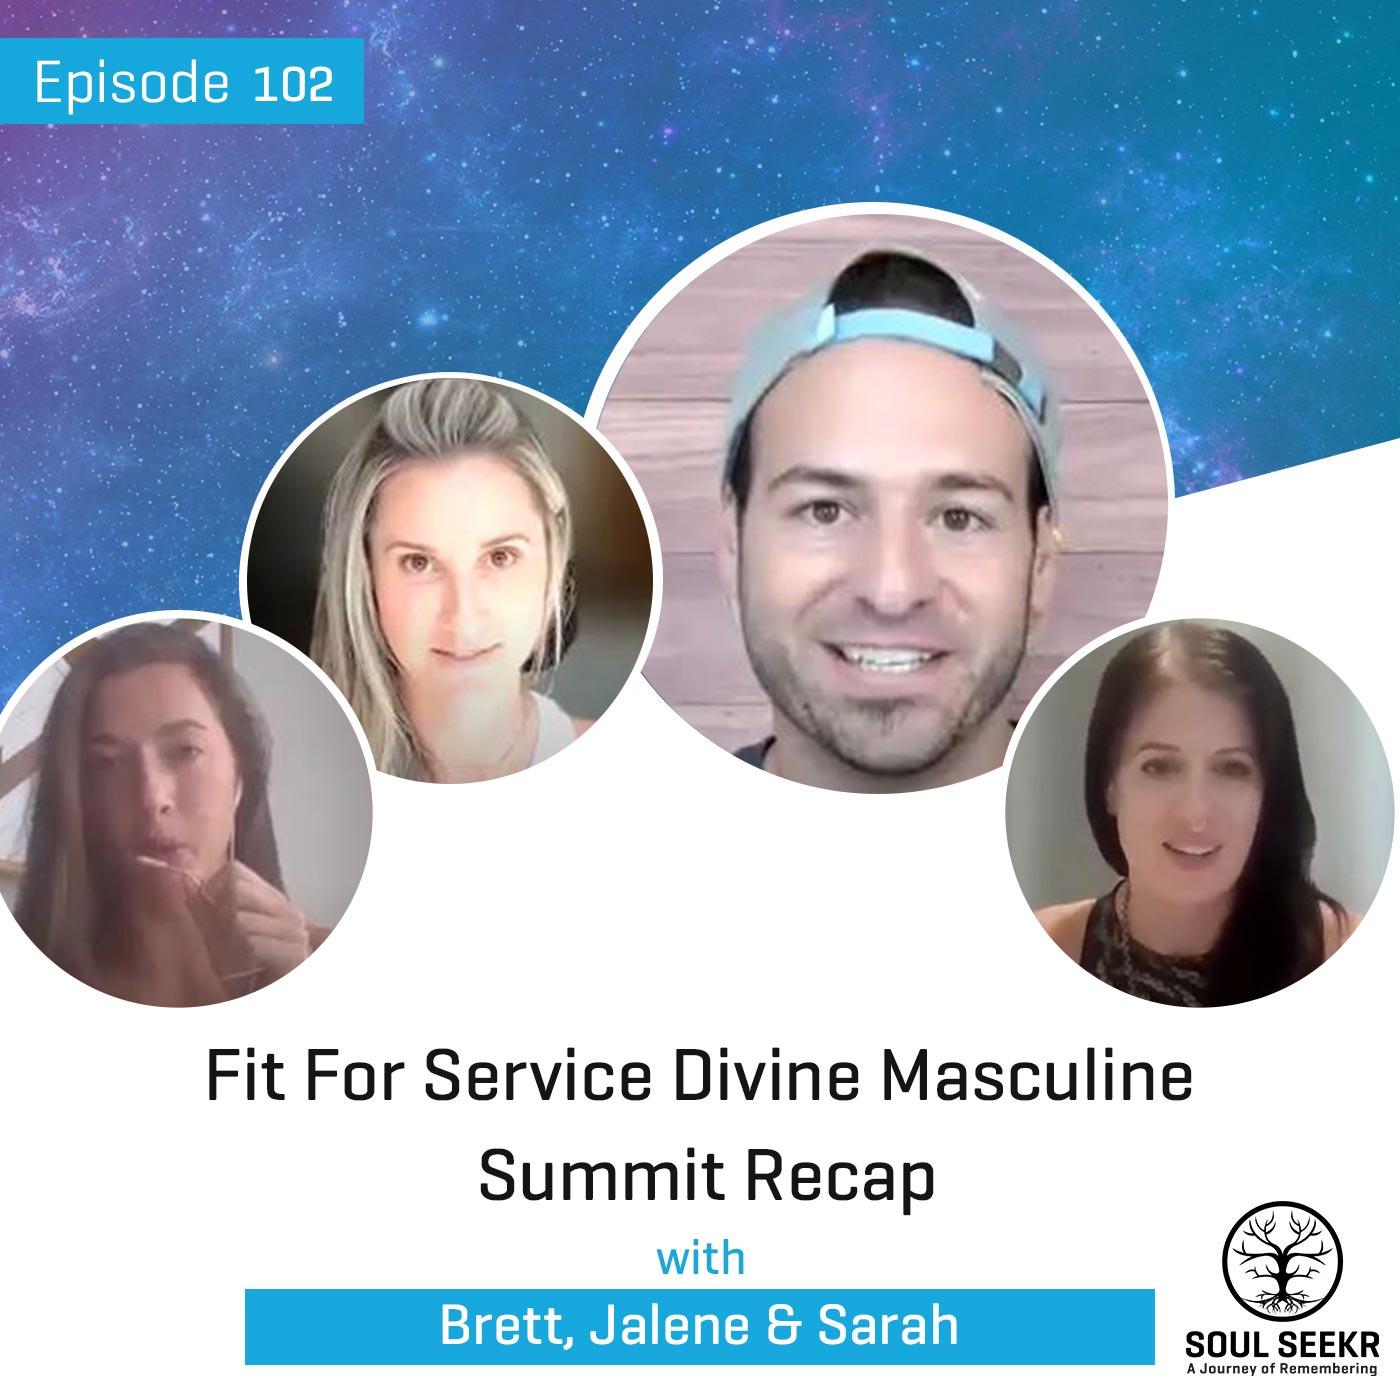 #102: Fit For Service Divine Masculine Summit Recap w/ Brett, Jalene & Sarah